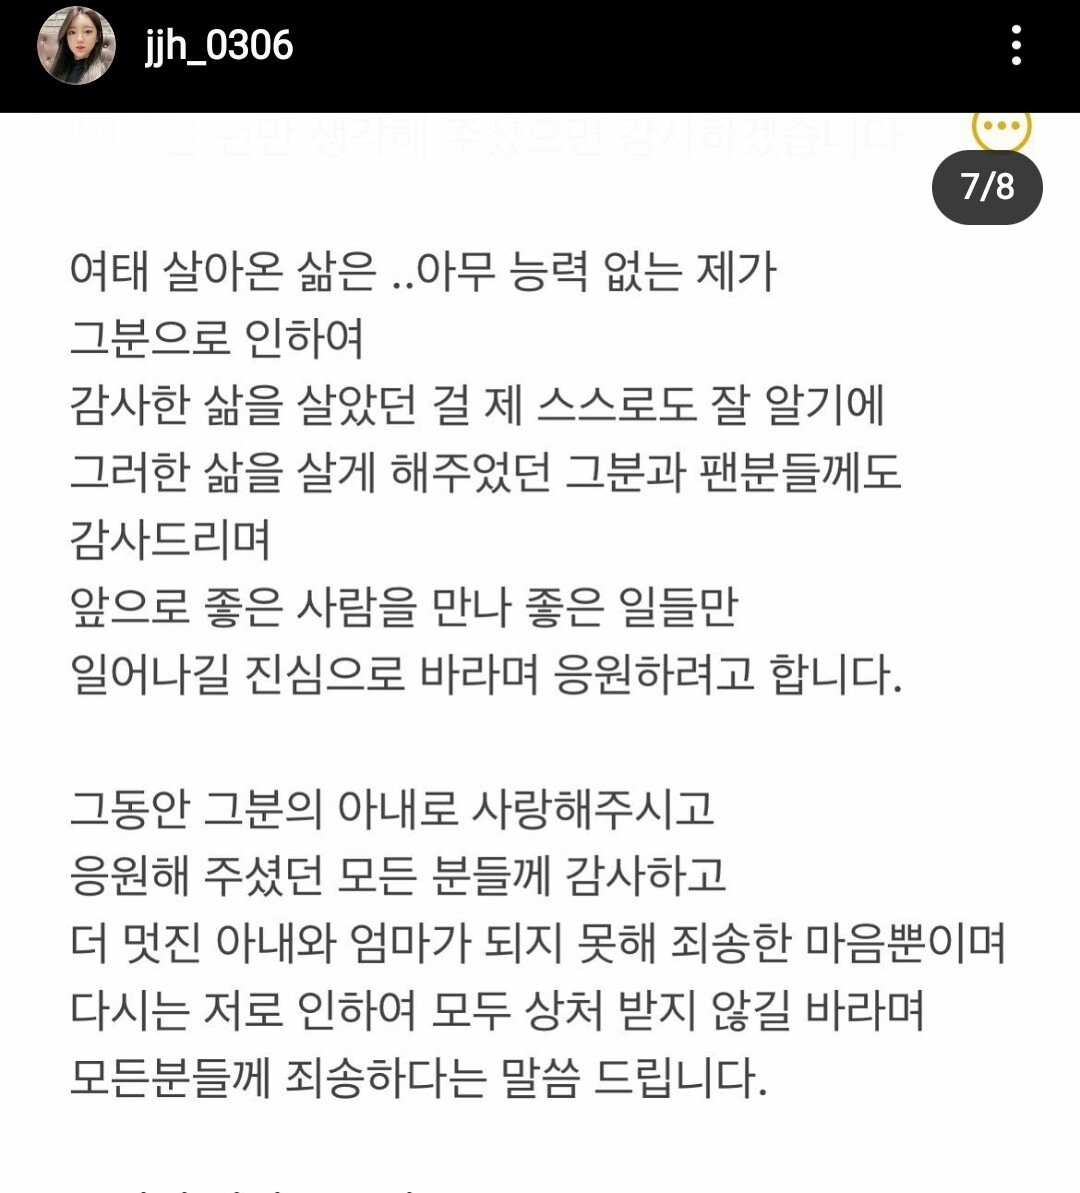 Screenshot_20210616-013212_Instagram.jpg [스압] BJ외질혜 인스타 피드사진 업로드....jpg